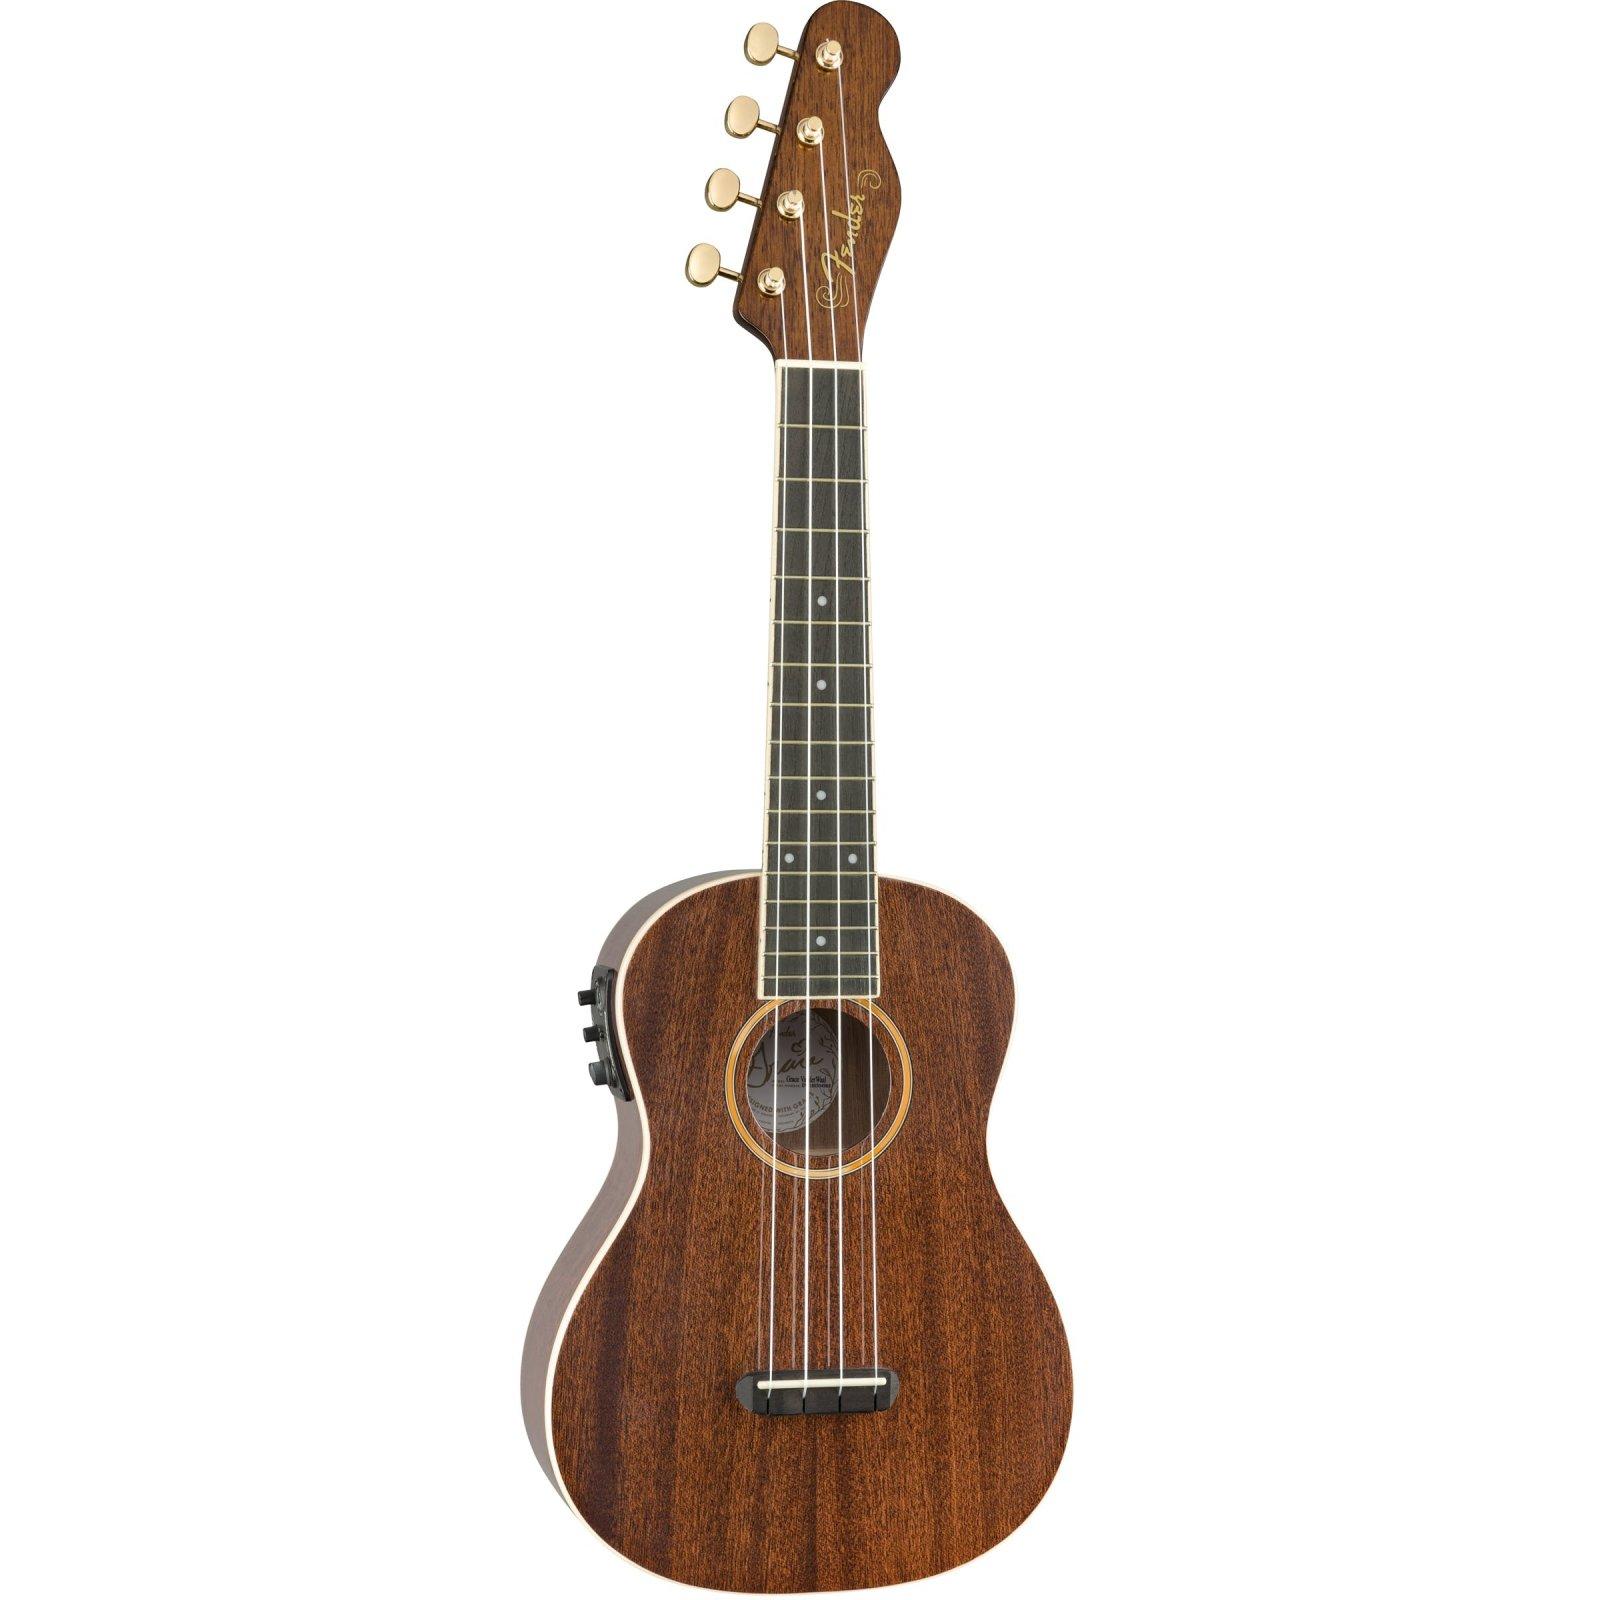 Fender Grace Vanderwaal Signature Acoustic/Electric Uke, Walnut, Concert Size